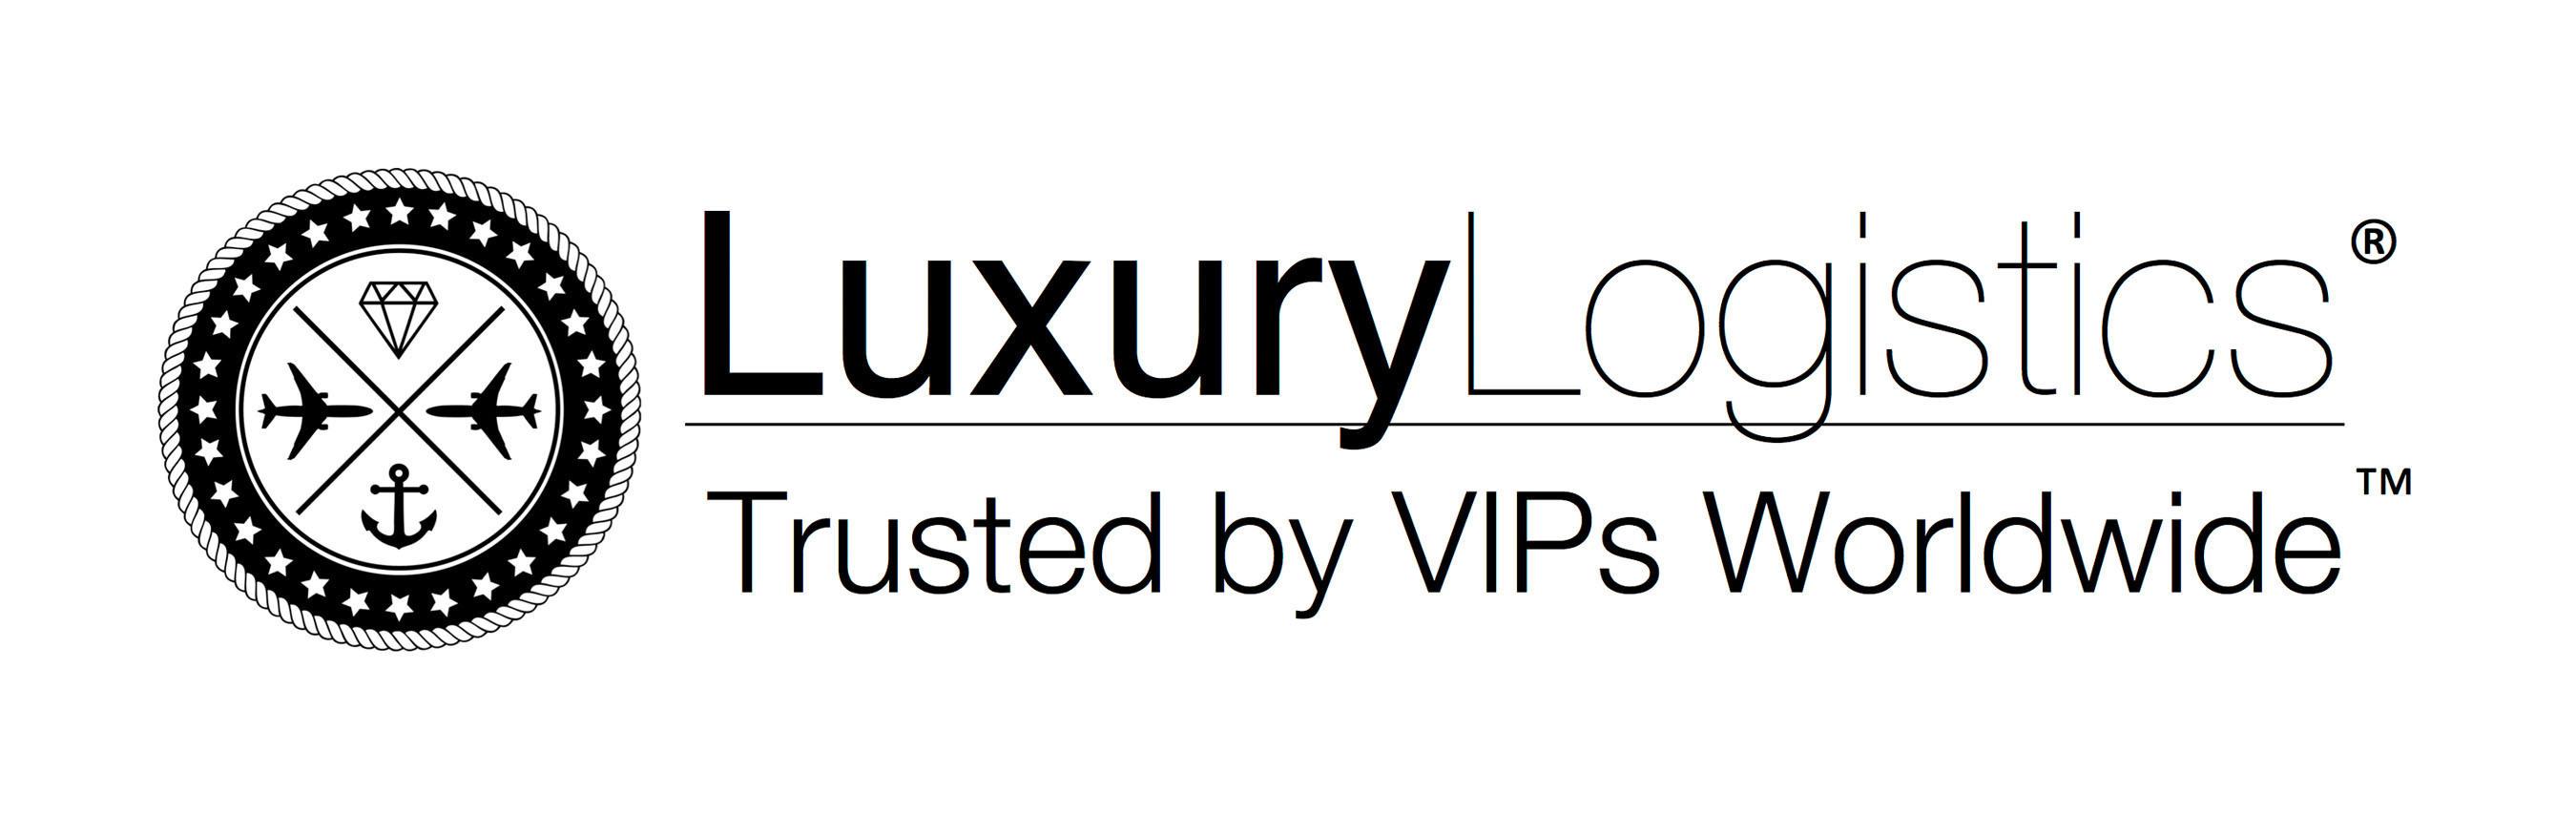 LuxuryLogistics Logo. (PRNewsFoto/LuxuryLogistics) (PRNewsFoto/LUXURYLOGISTICS)